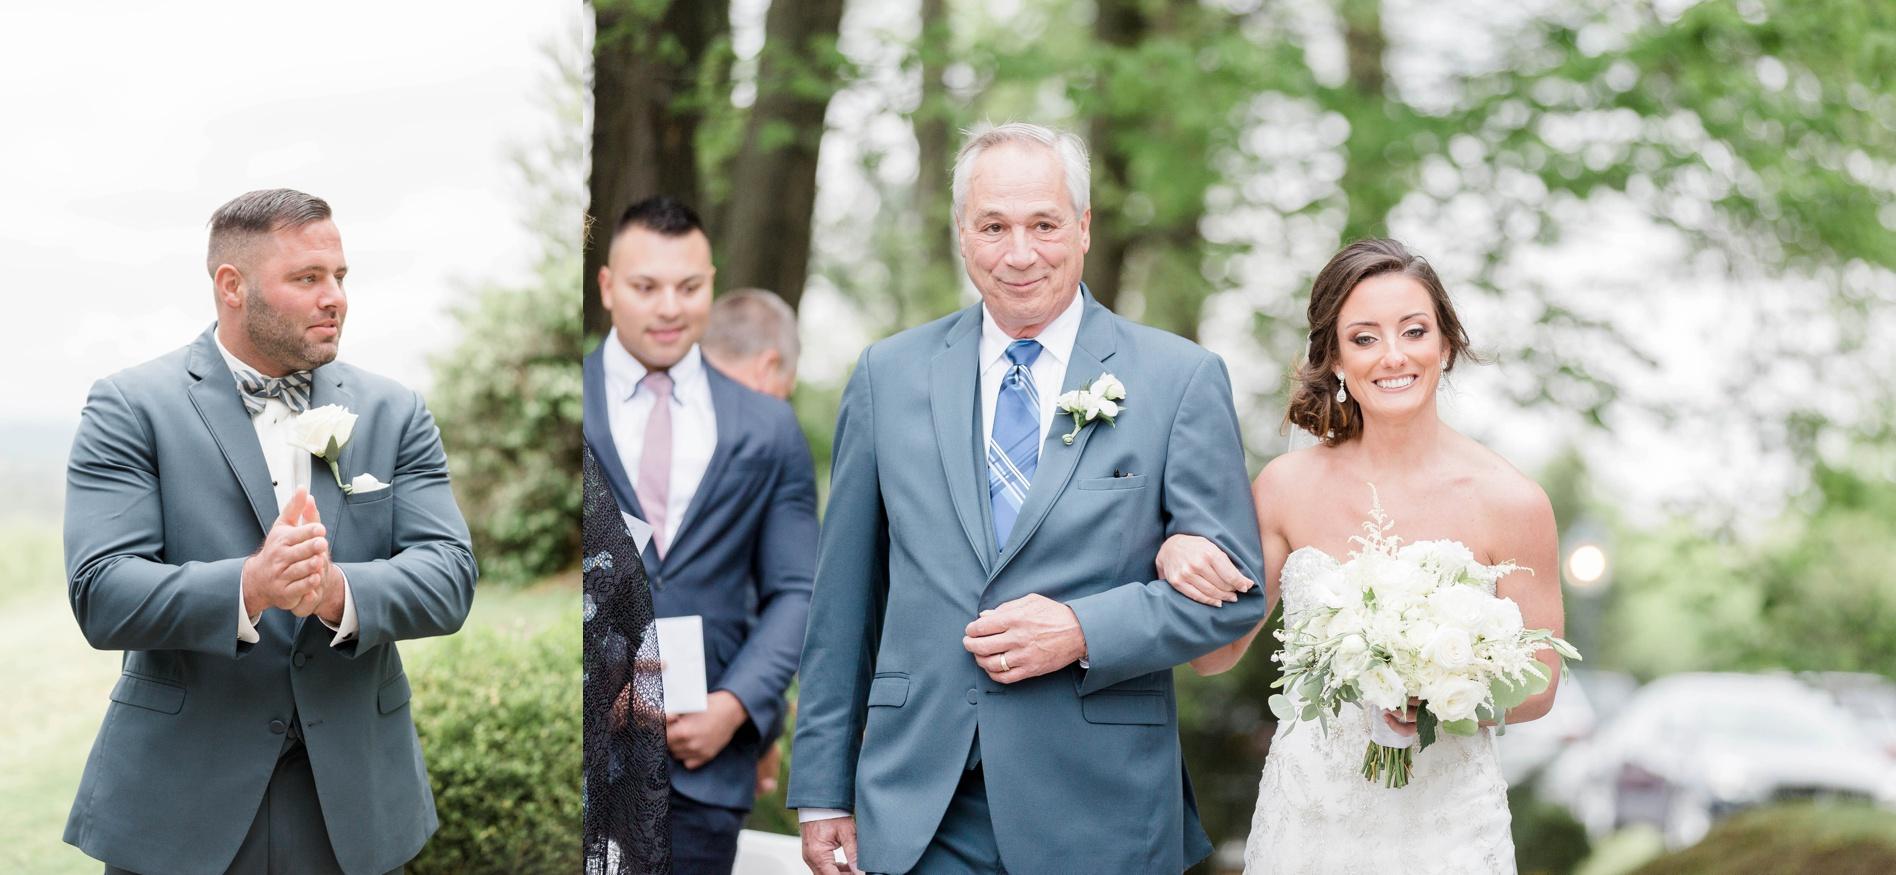 Amazing Mexican Wedding Suit Festooning - All Wedding Dresses ...